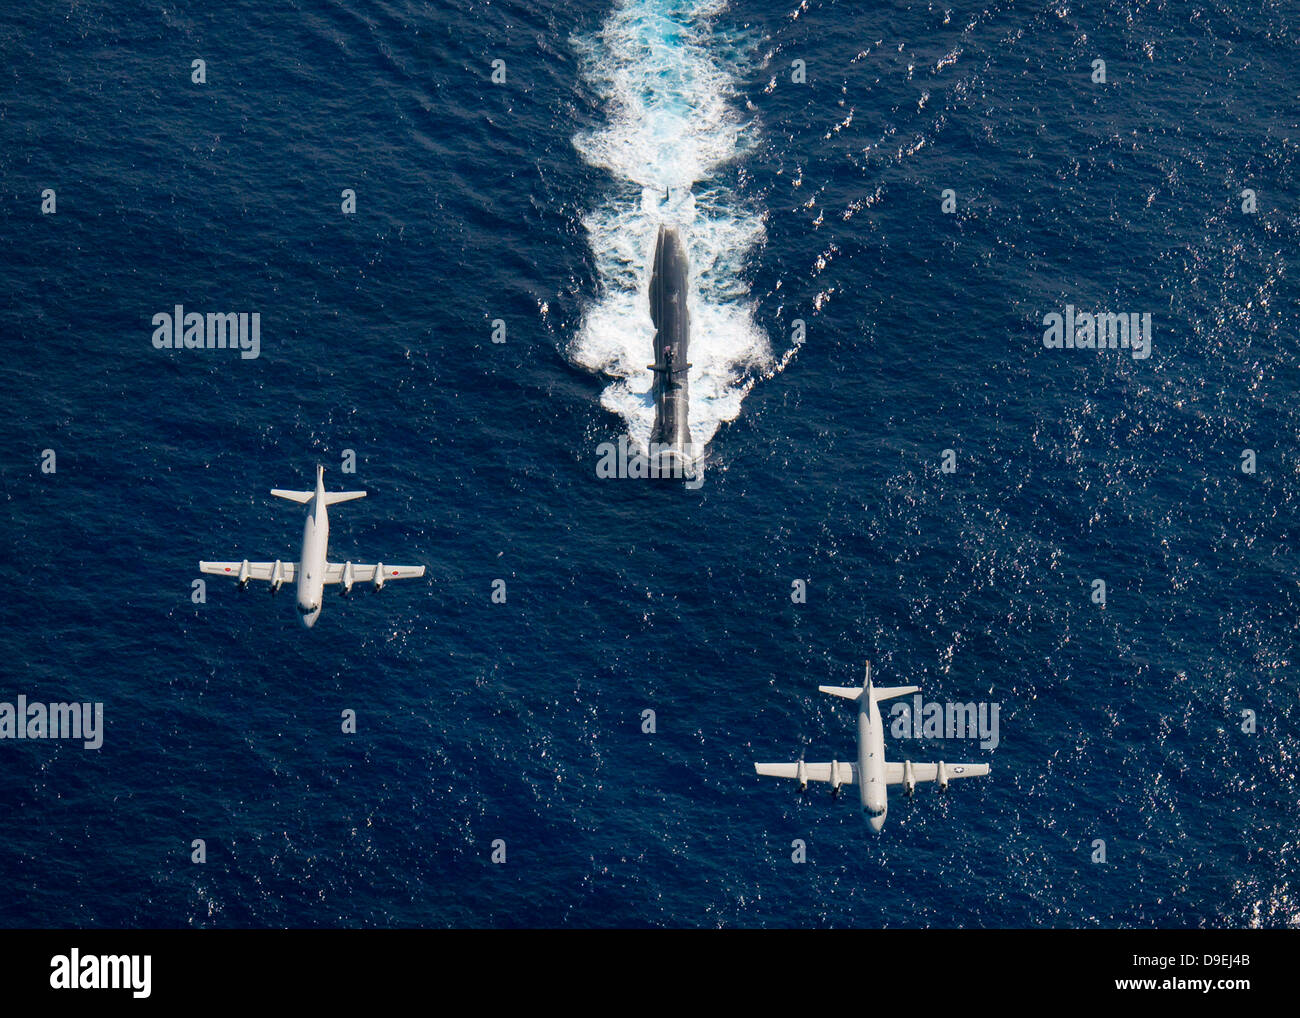 Dos P-3 Orion de aviones de vigilancia marítima sobrevolar ataque submarino USS Houston. Imagen De Stock